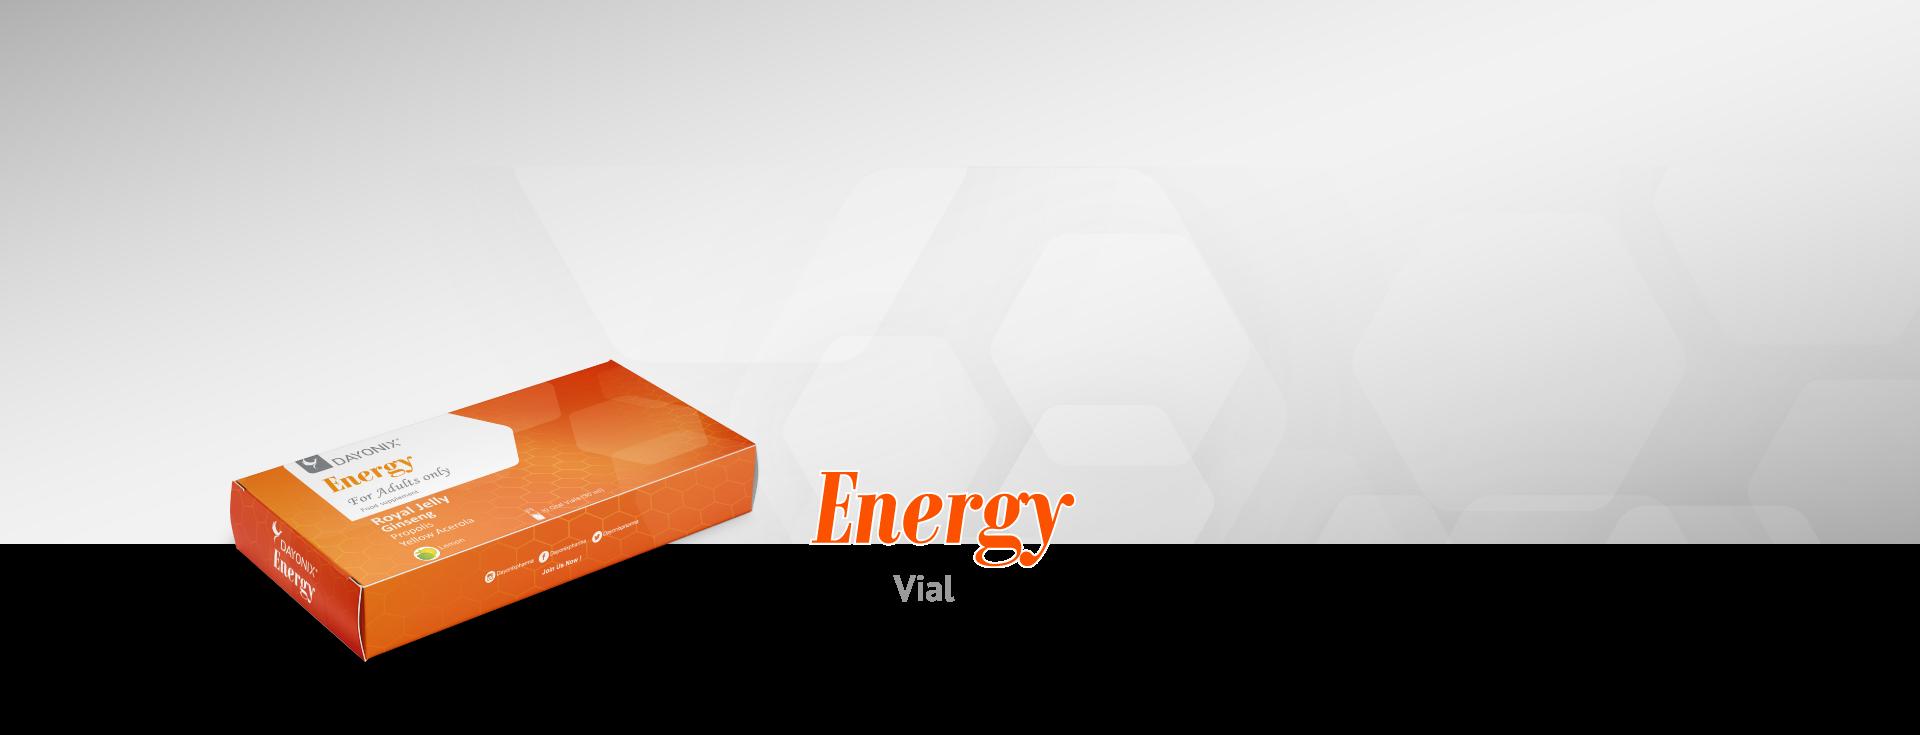 Dayonix Energy Vial